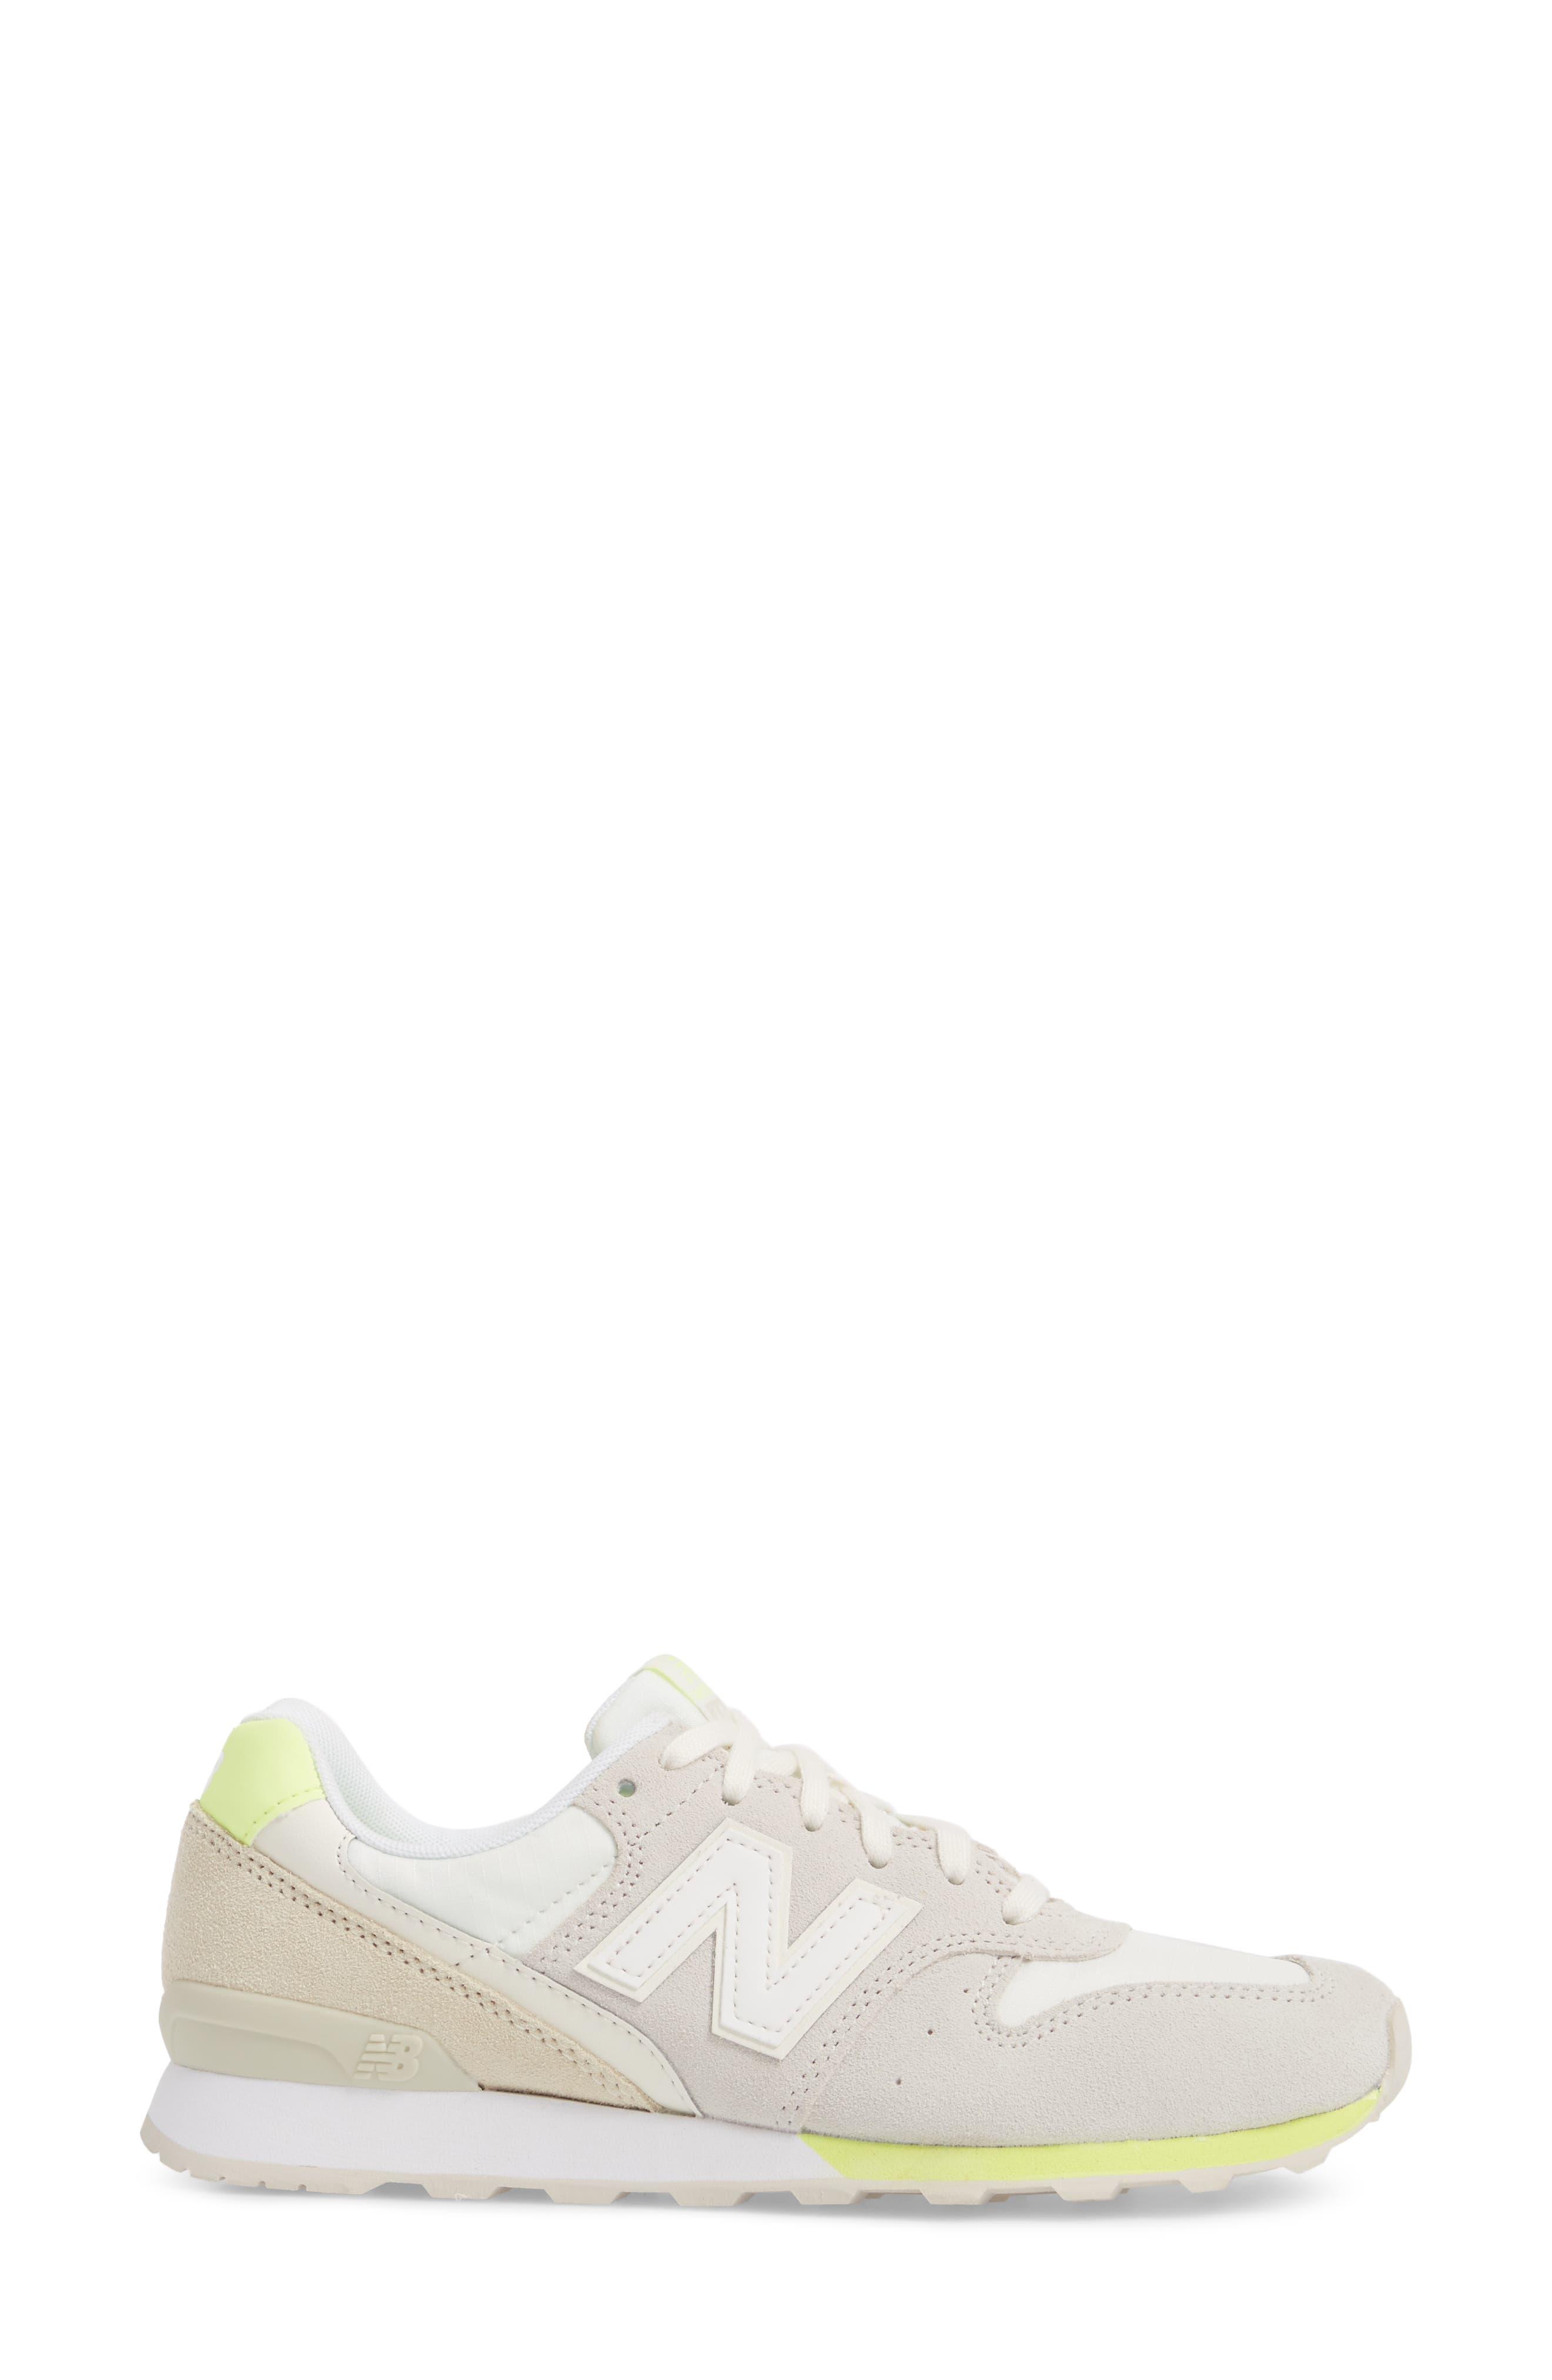 696 Suede Sneaker,                             Alternate thumbnail 3, color,                             250